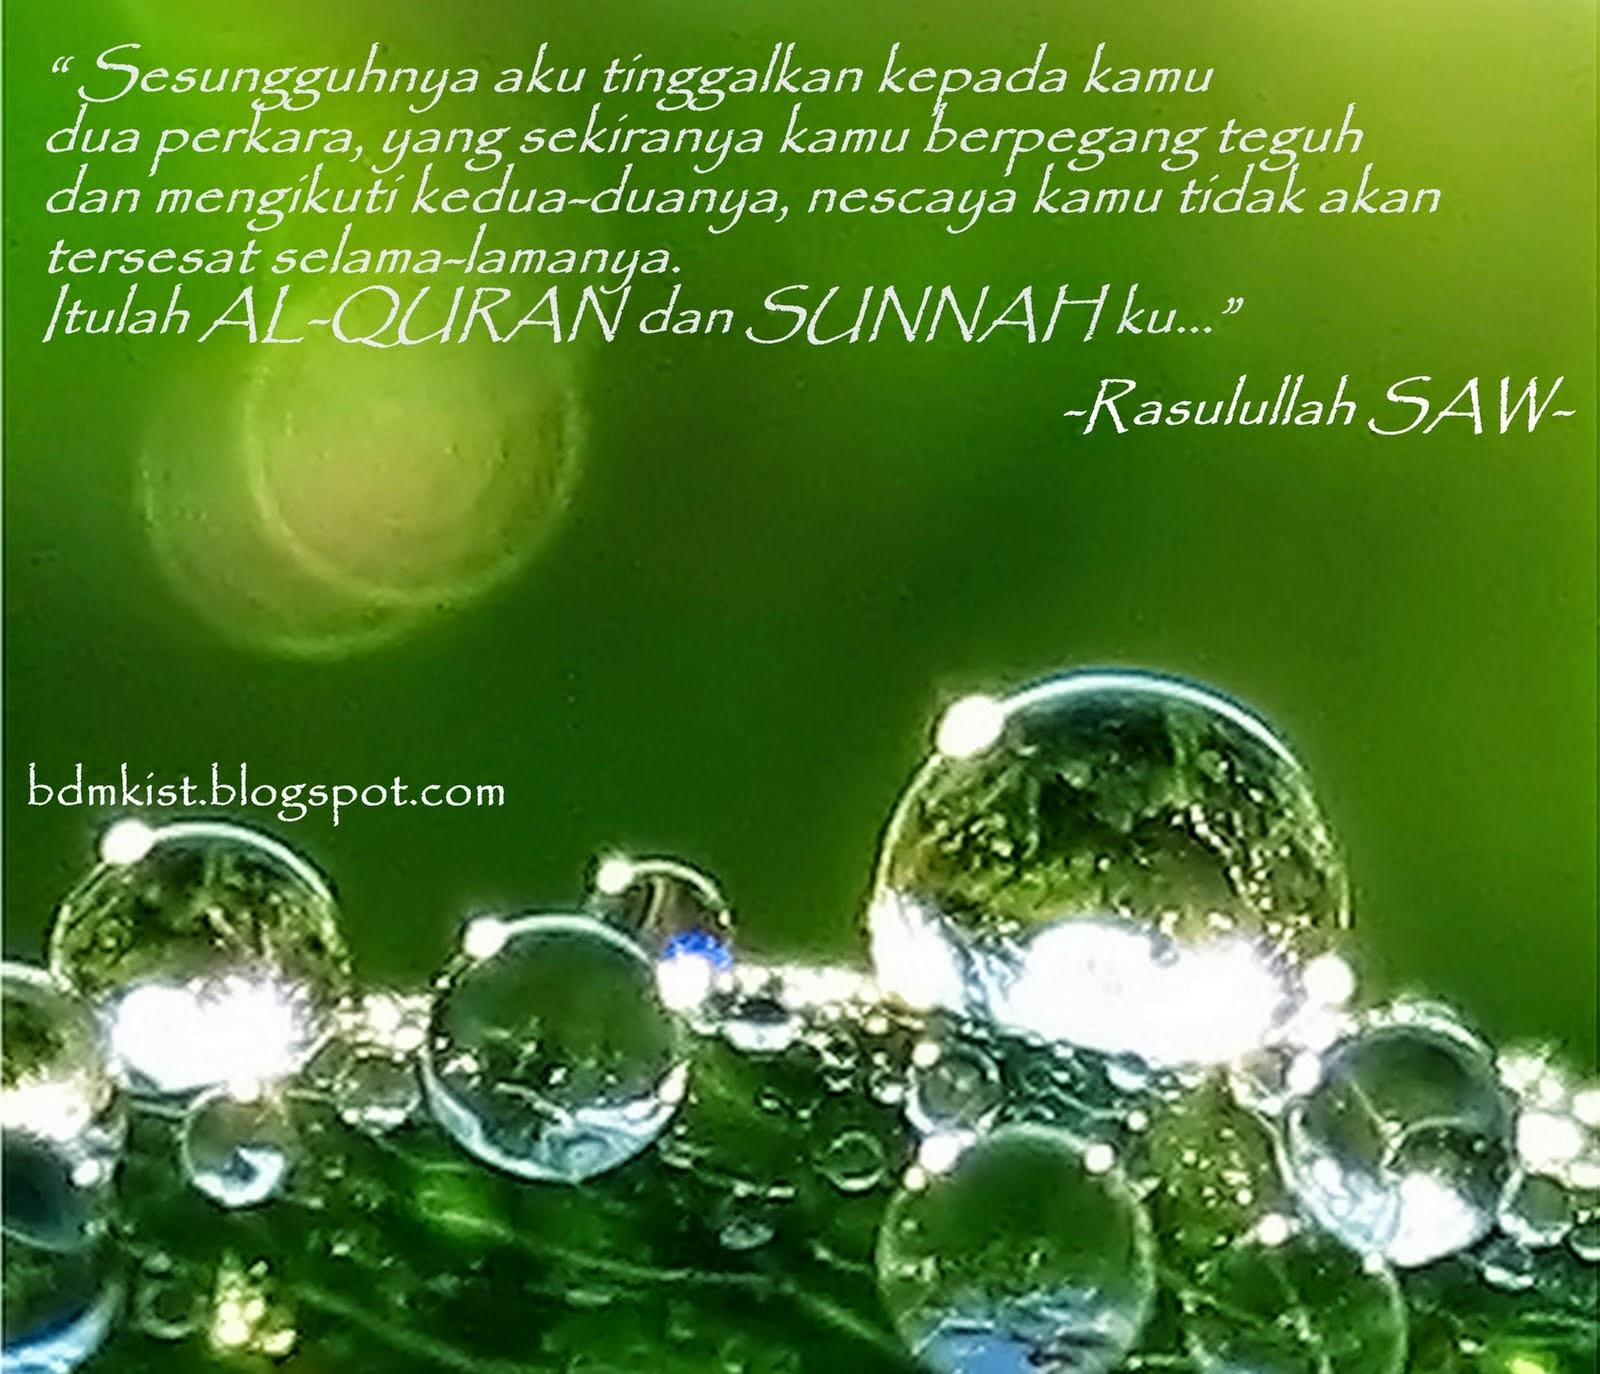 http://fiezabard.blogspot.com/2014/09/cinta-rasul-kenali-biodata-rasulullah.html